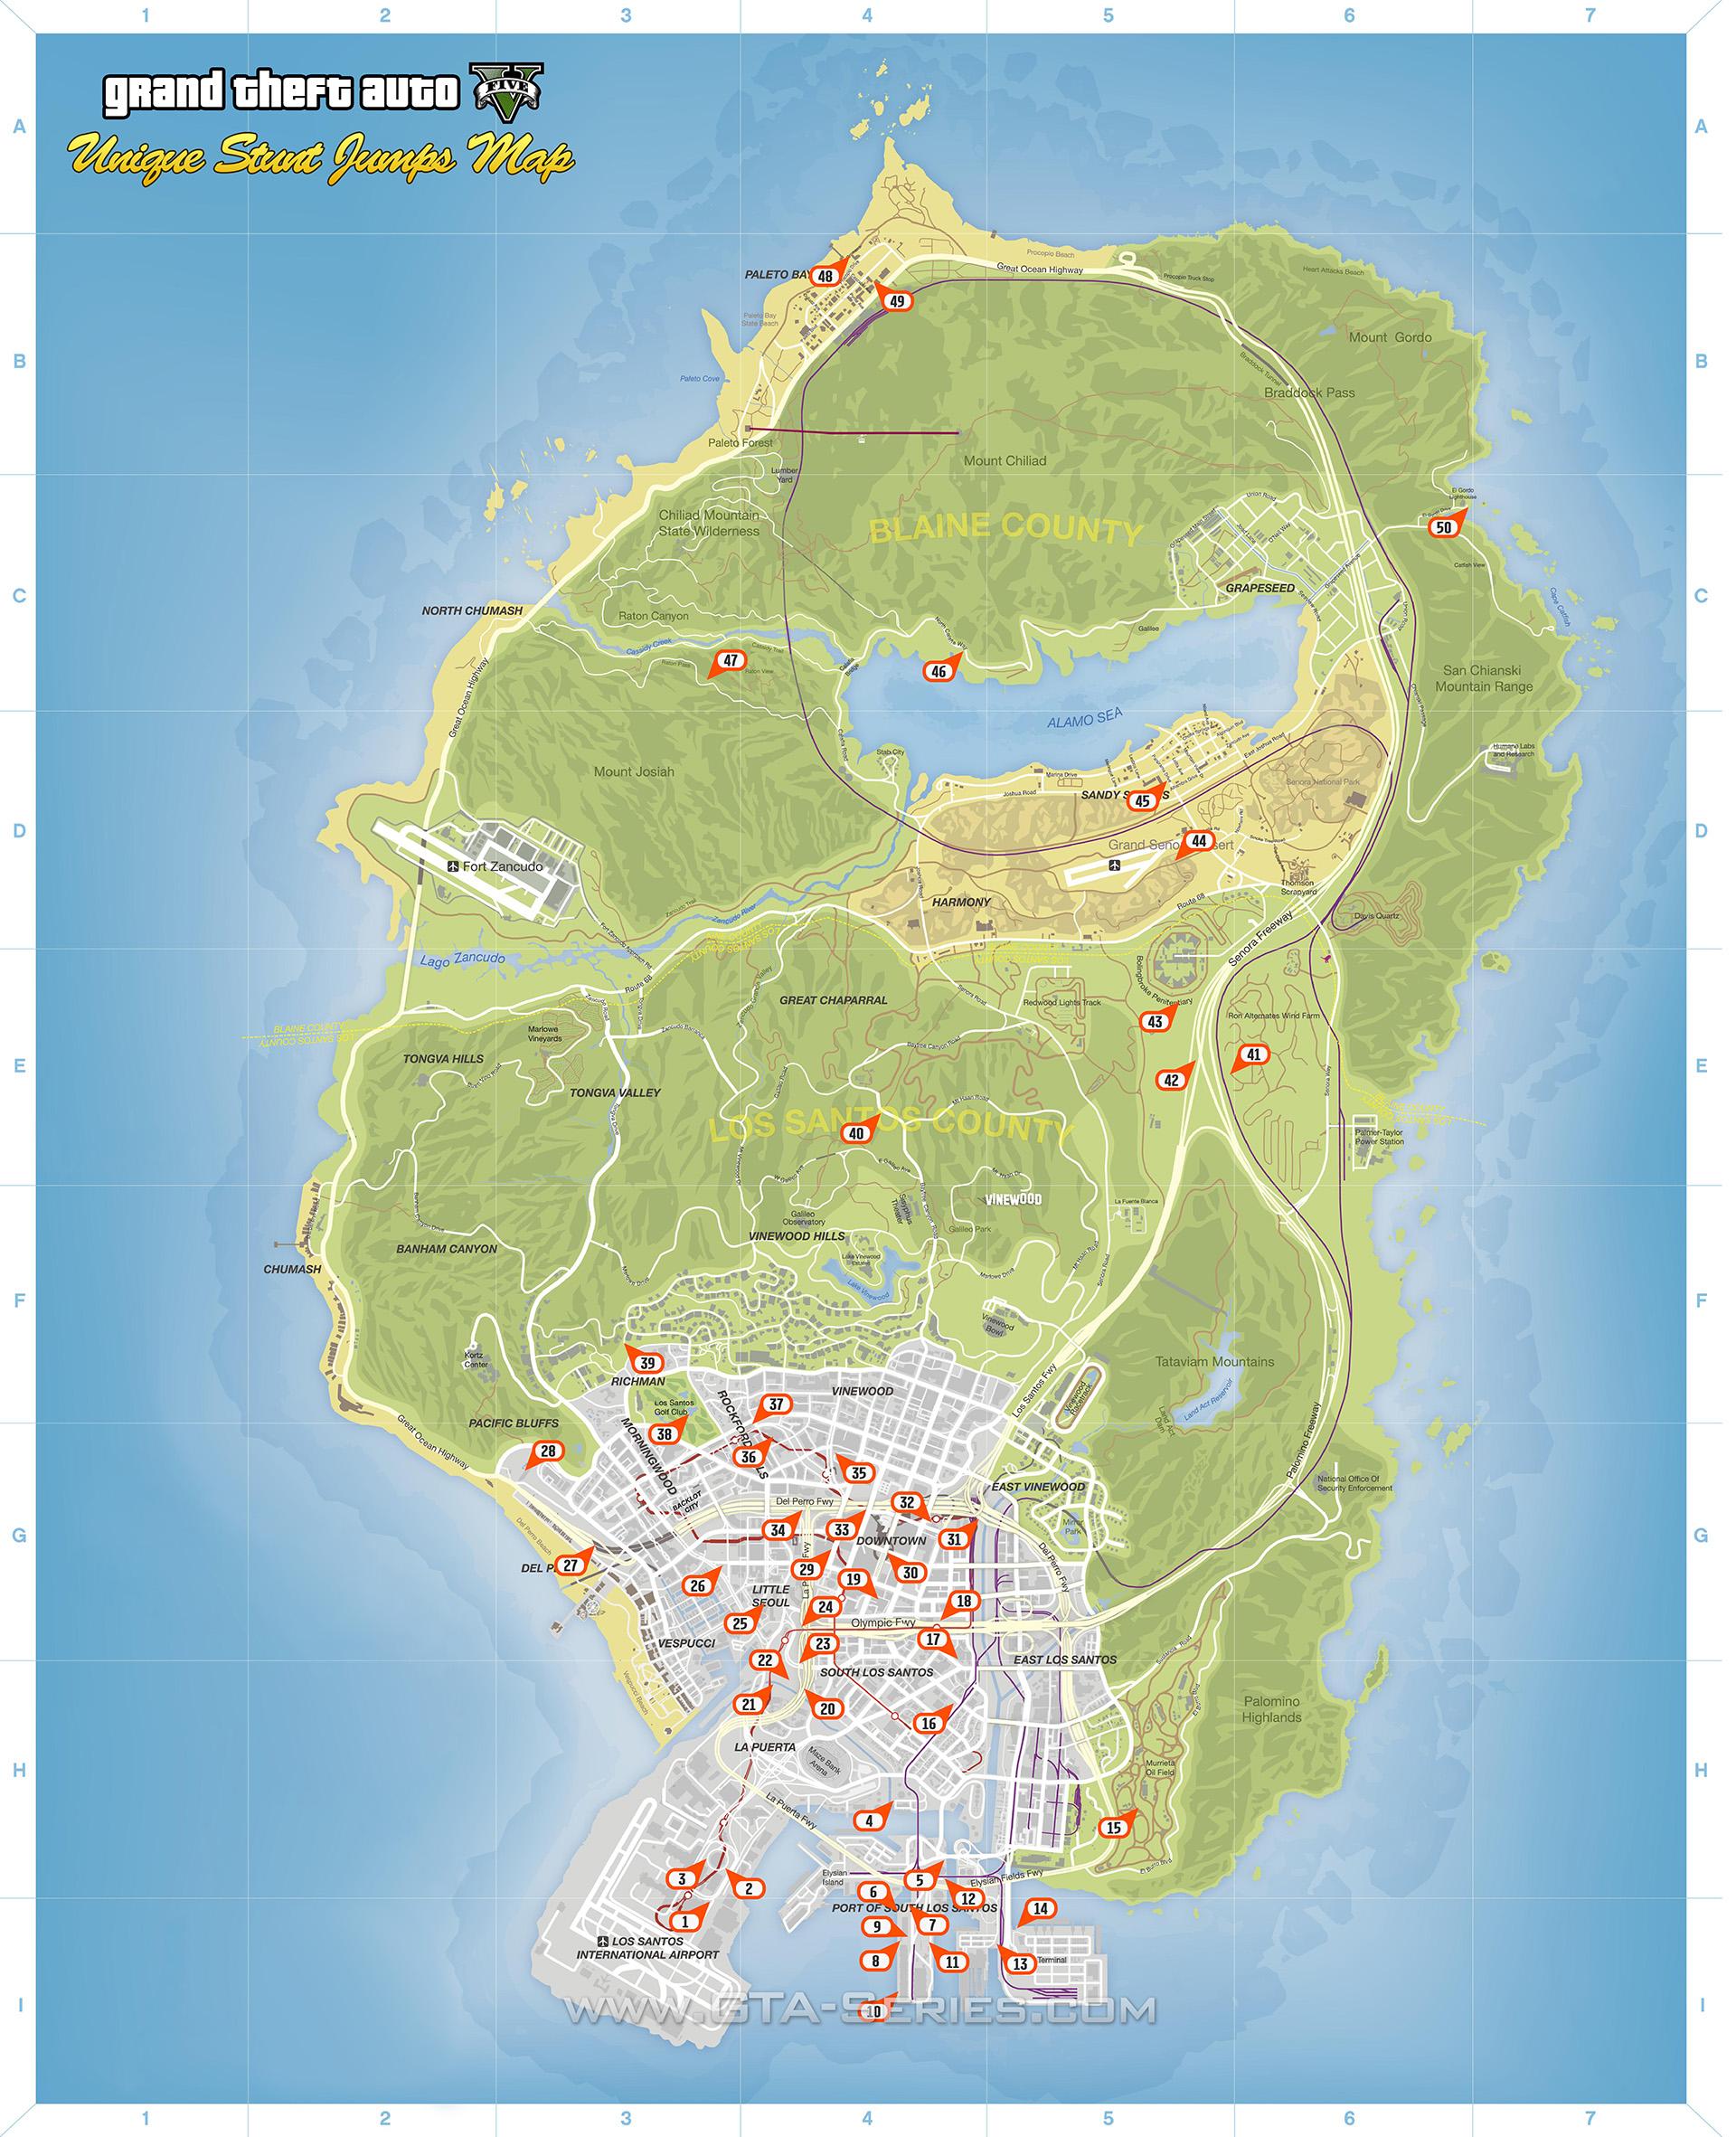 GTASeriescom  GTA 5  Mappe tematiche